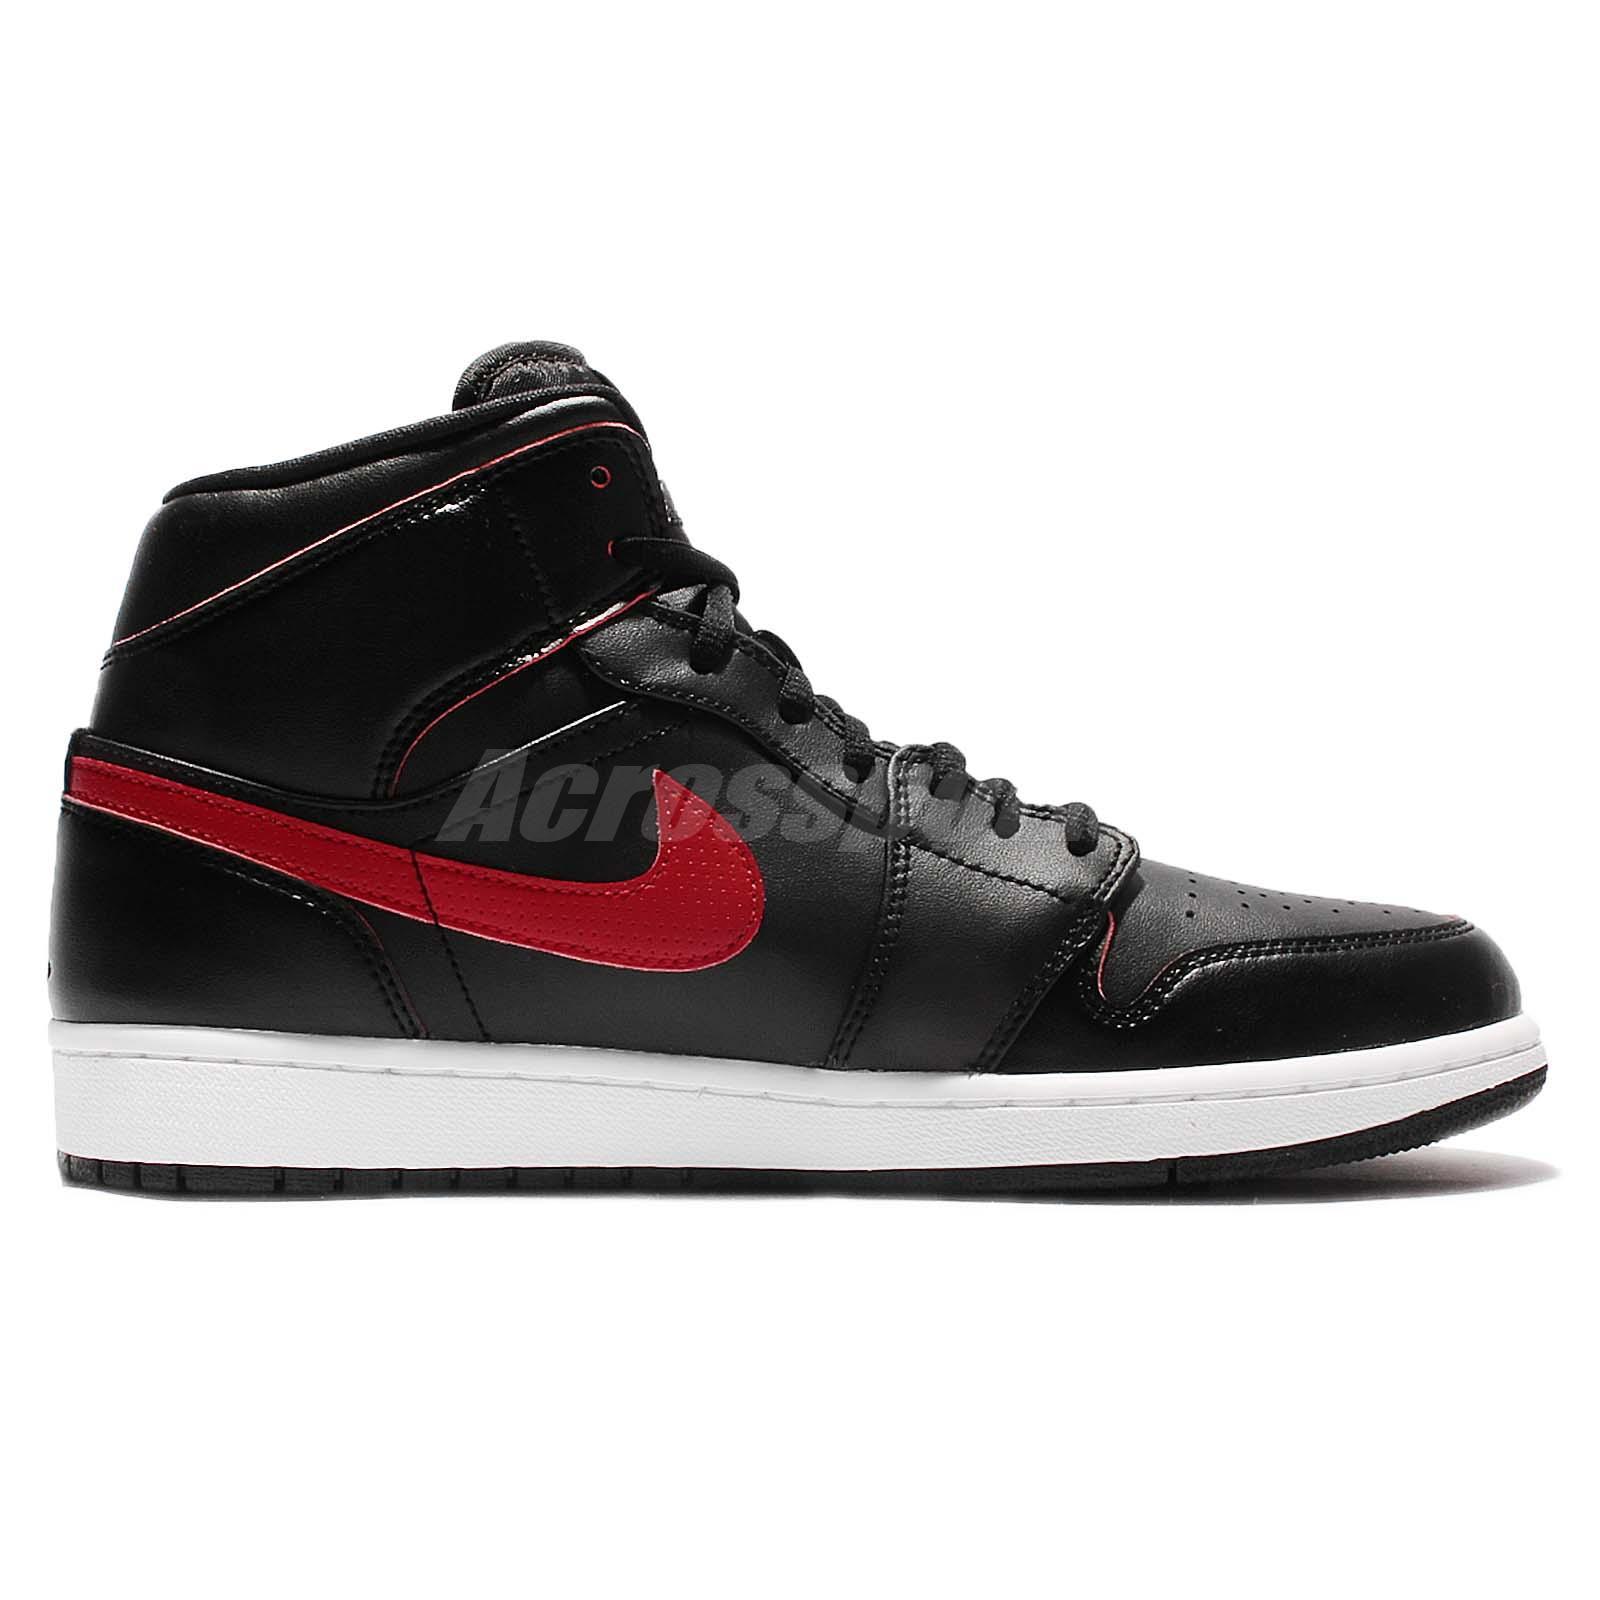 f64253ca757a ... Condition Brand New With Box Nike Air Jordan 1 Mid Mens Basketball  Shoes Nike Jordan ...